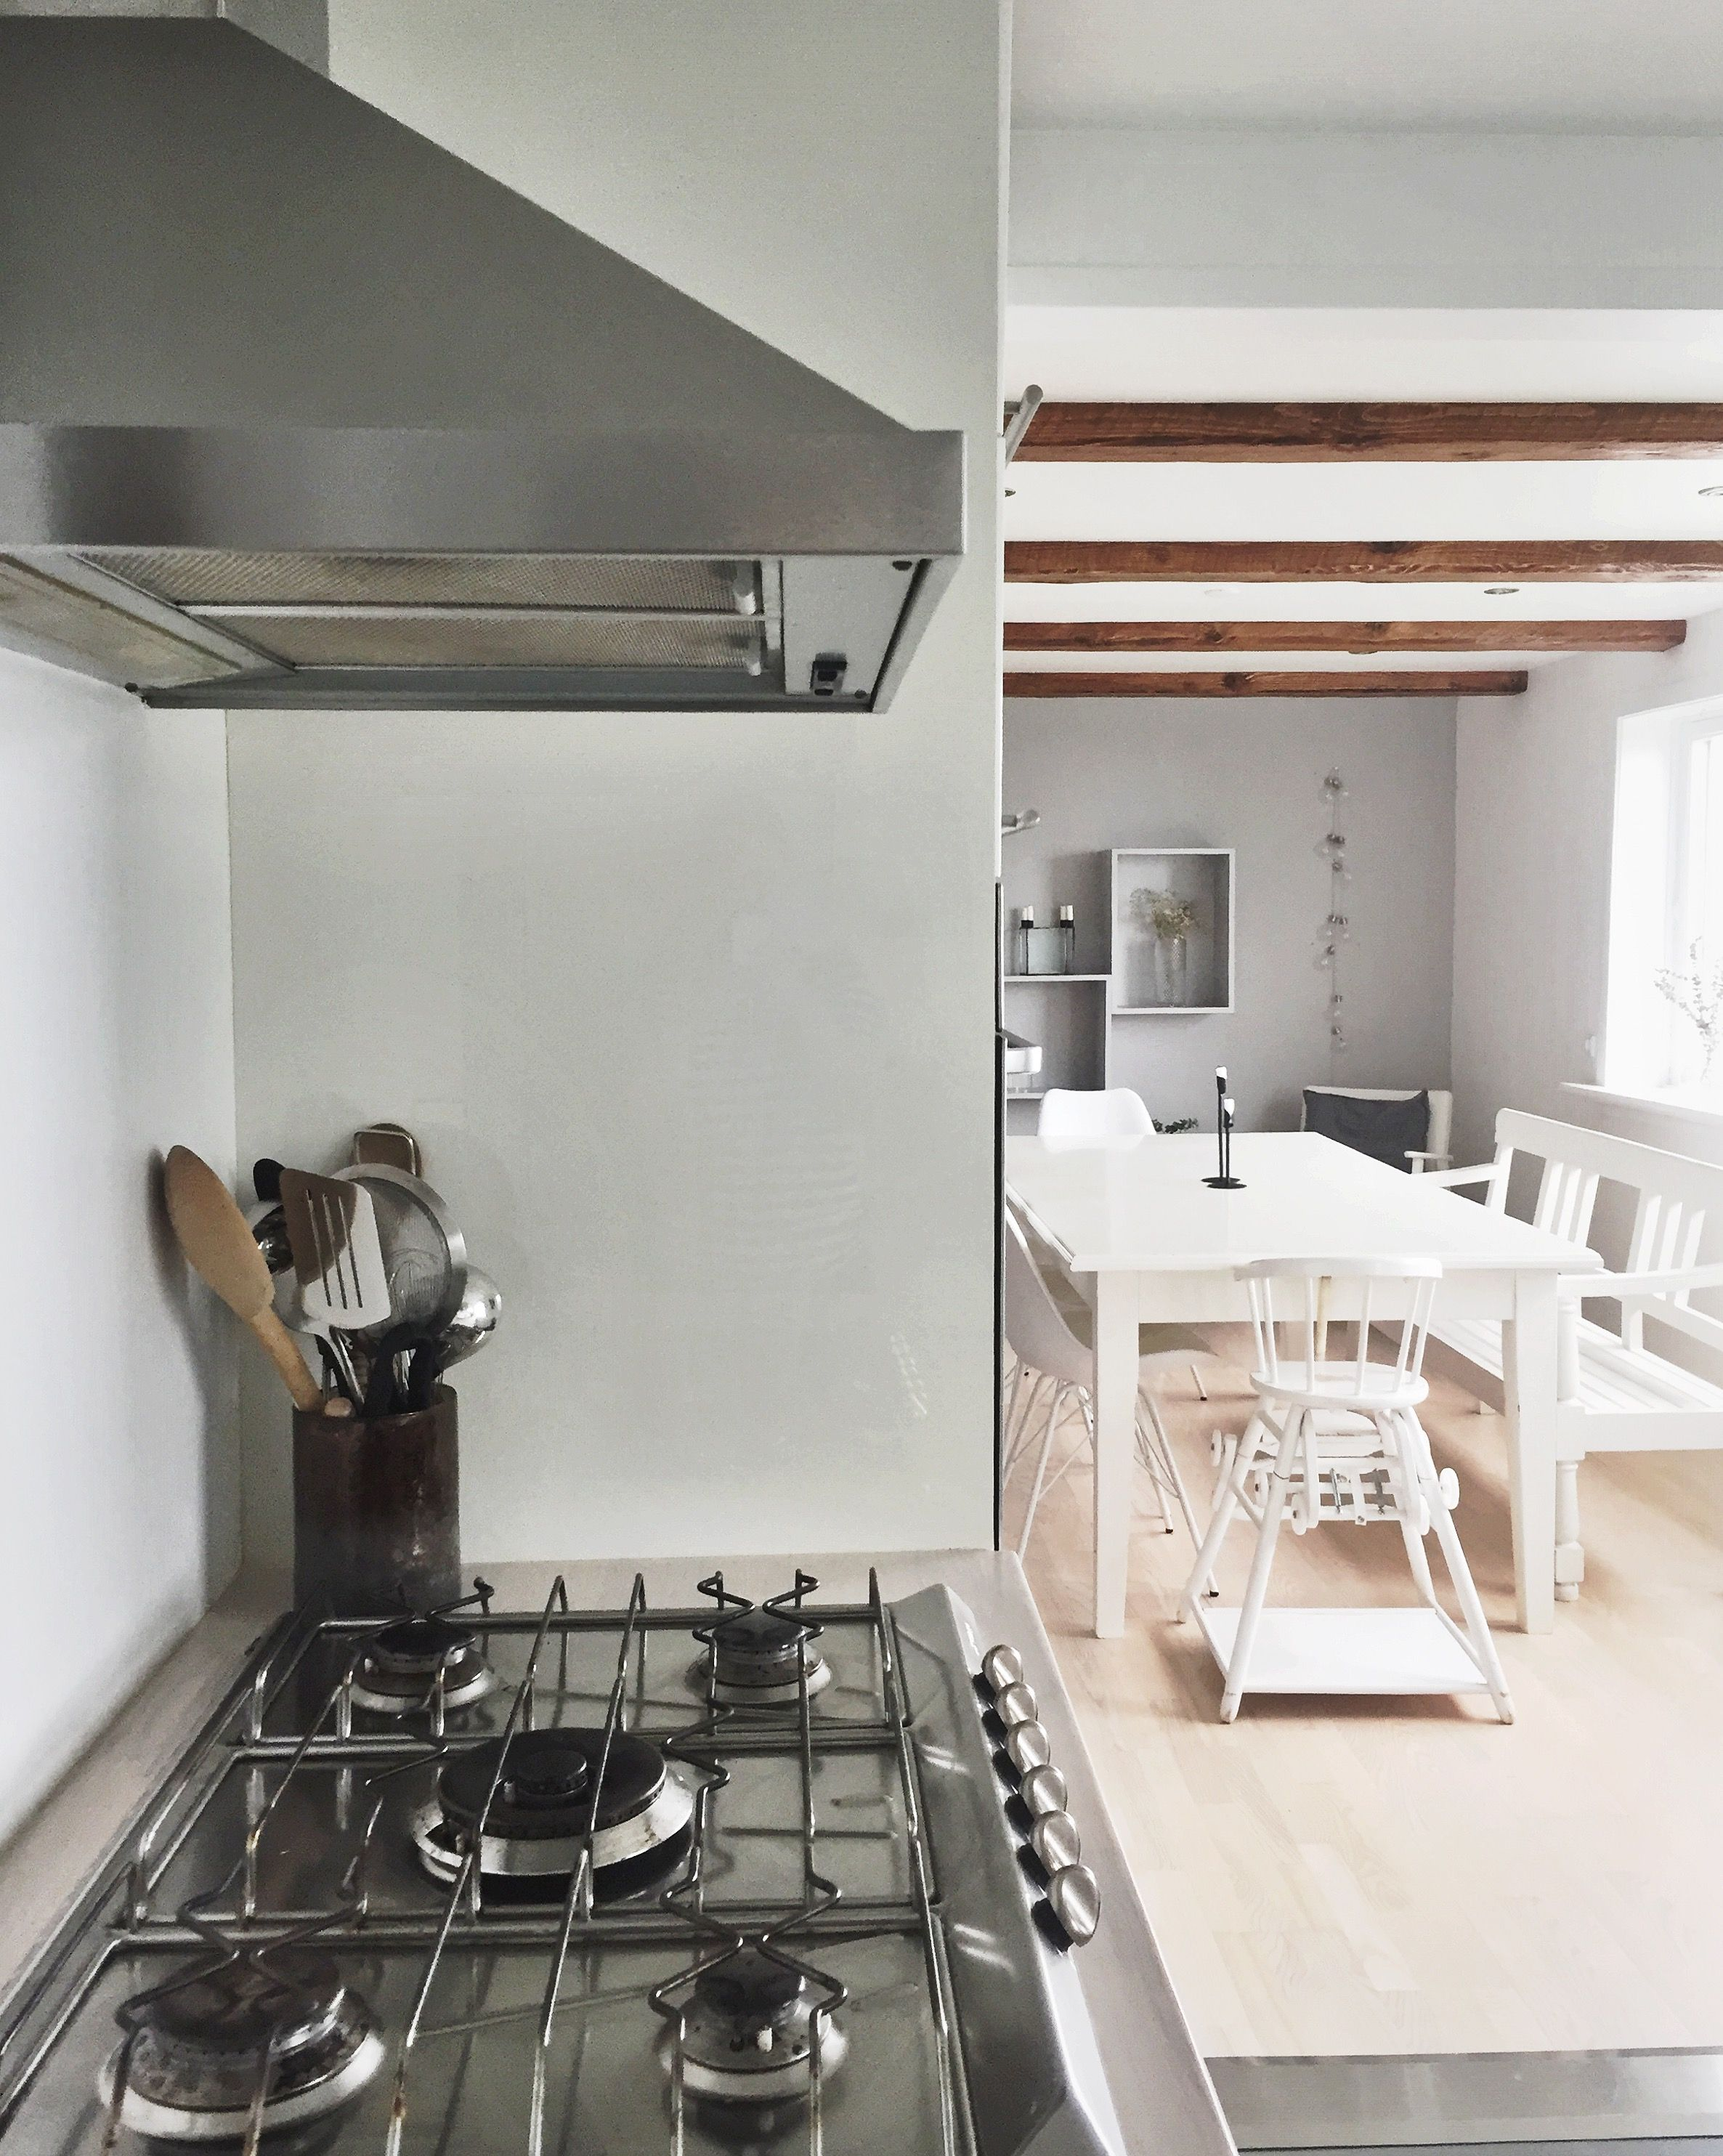 Small Kitchensmodern Kitchenswhite Kitchensdream Kitchensgray And White Kitchennice Kitchenkitchen Ideaskitchen